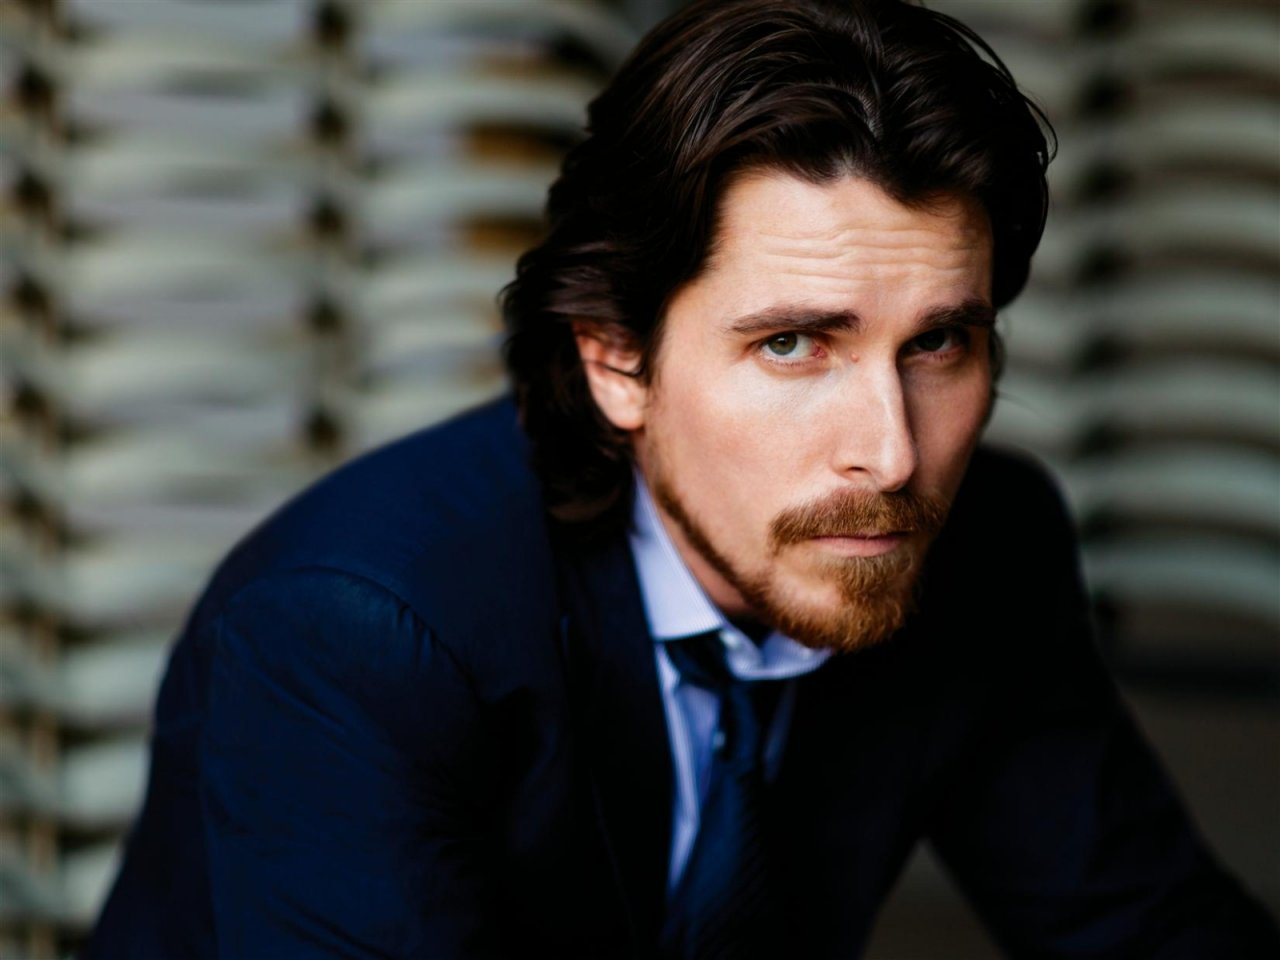 Christian Bale Wallpaper